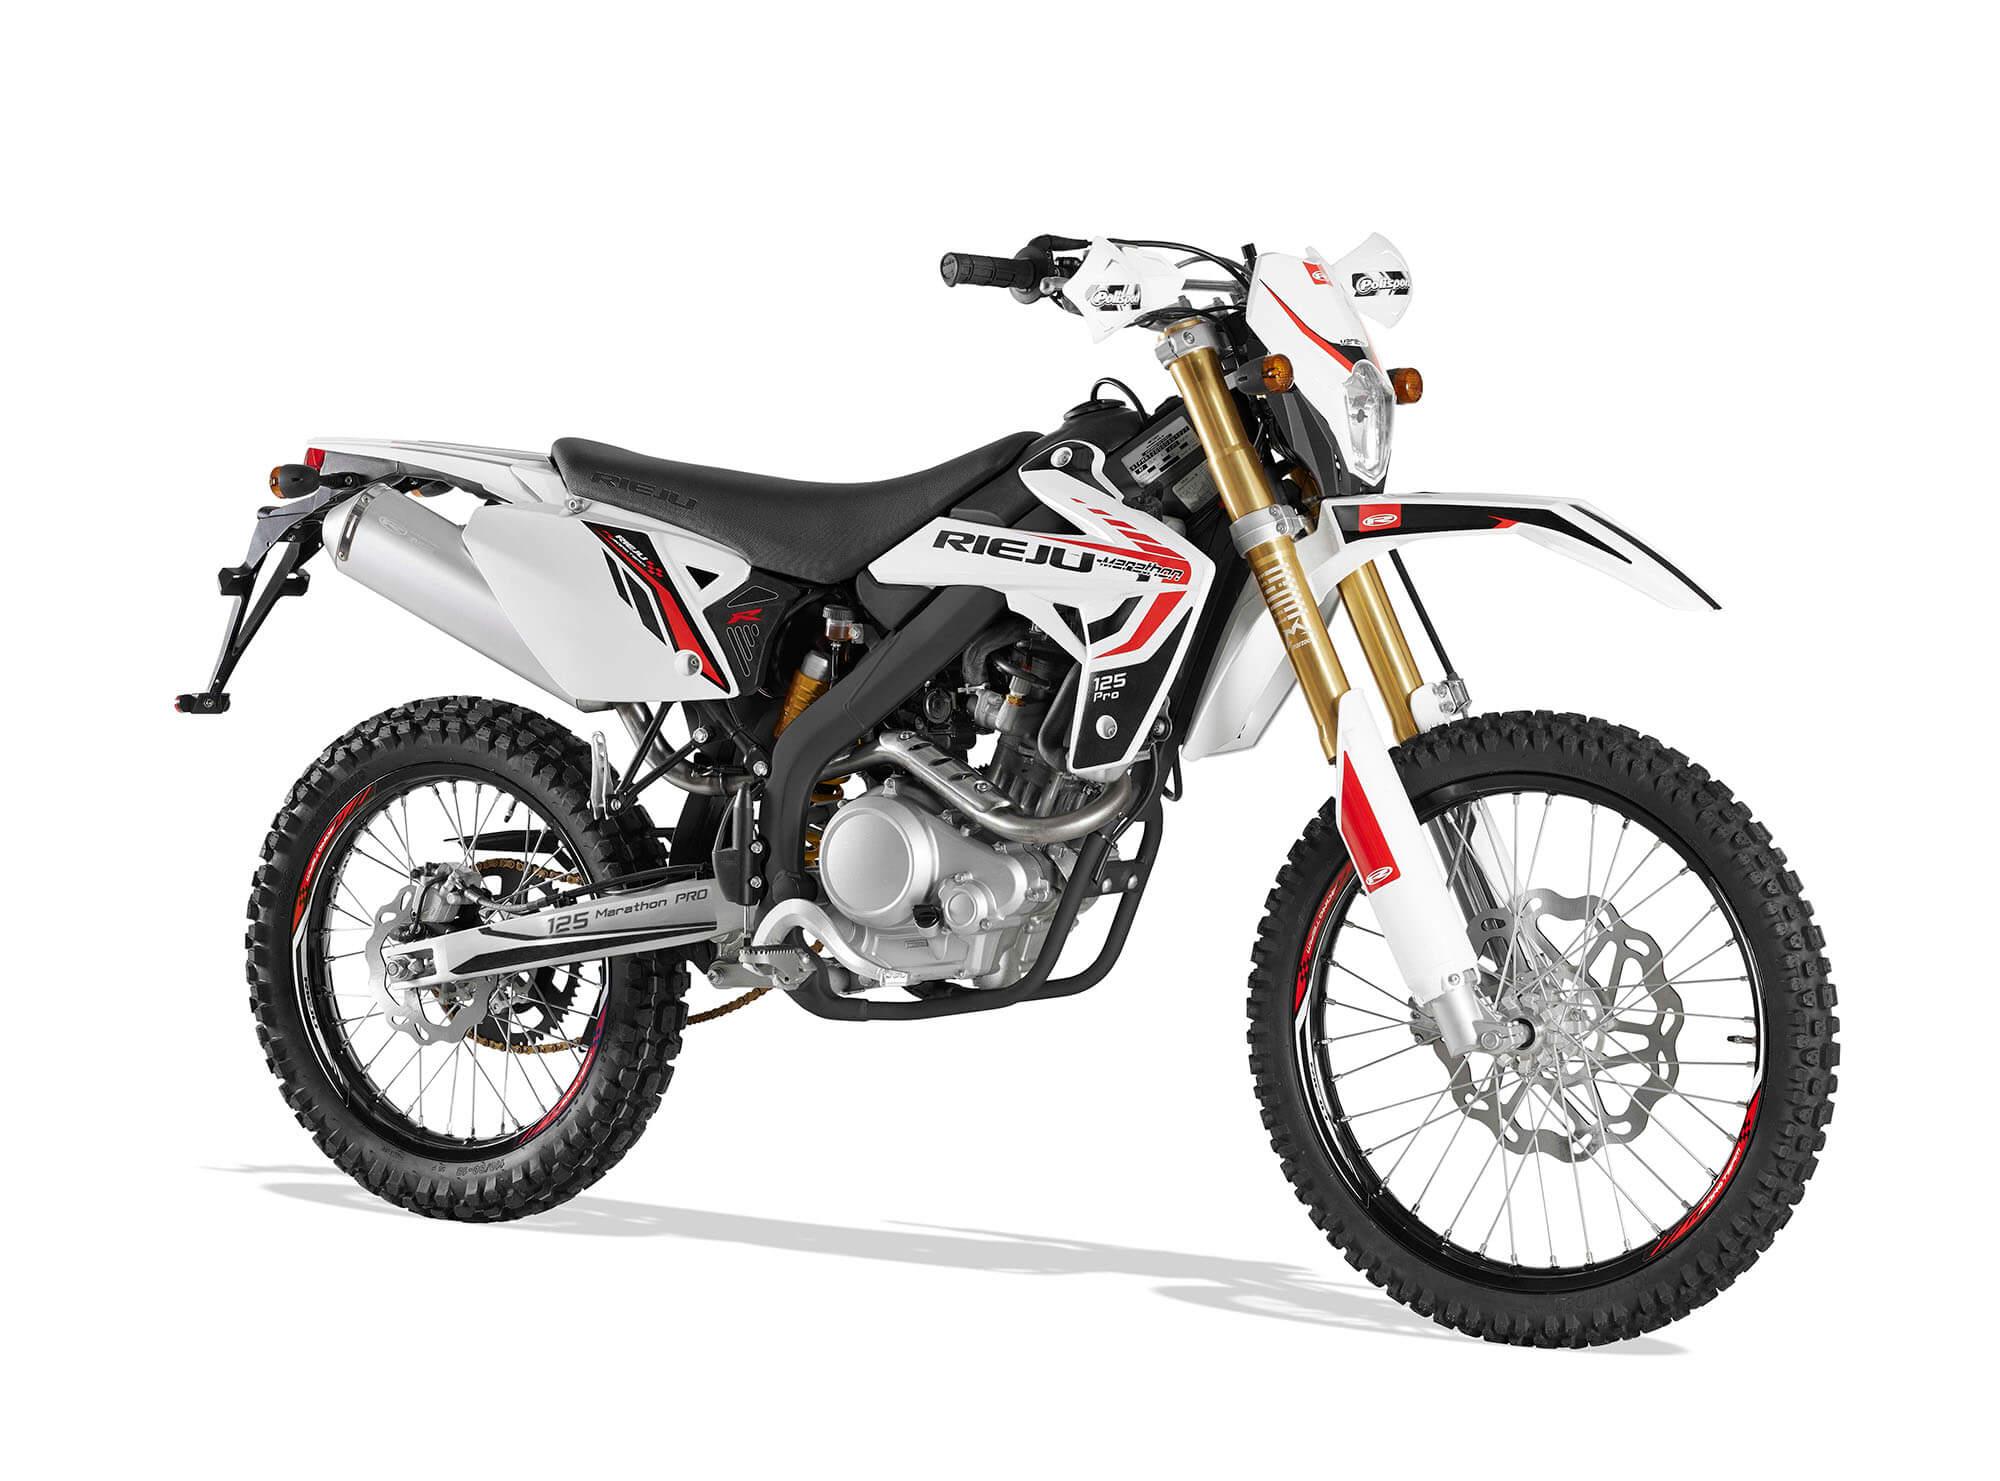 comprar-motos-rieju-marathon-pro-125-blanco-motissimo-barcelona